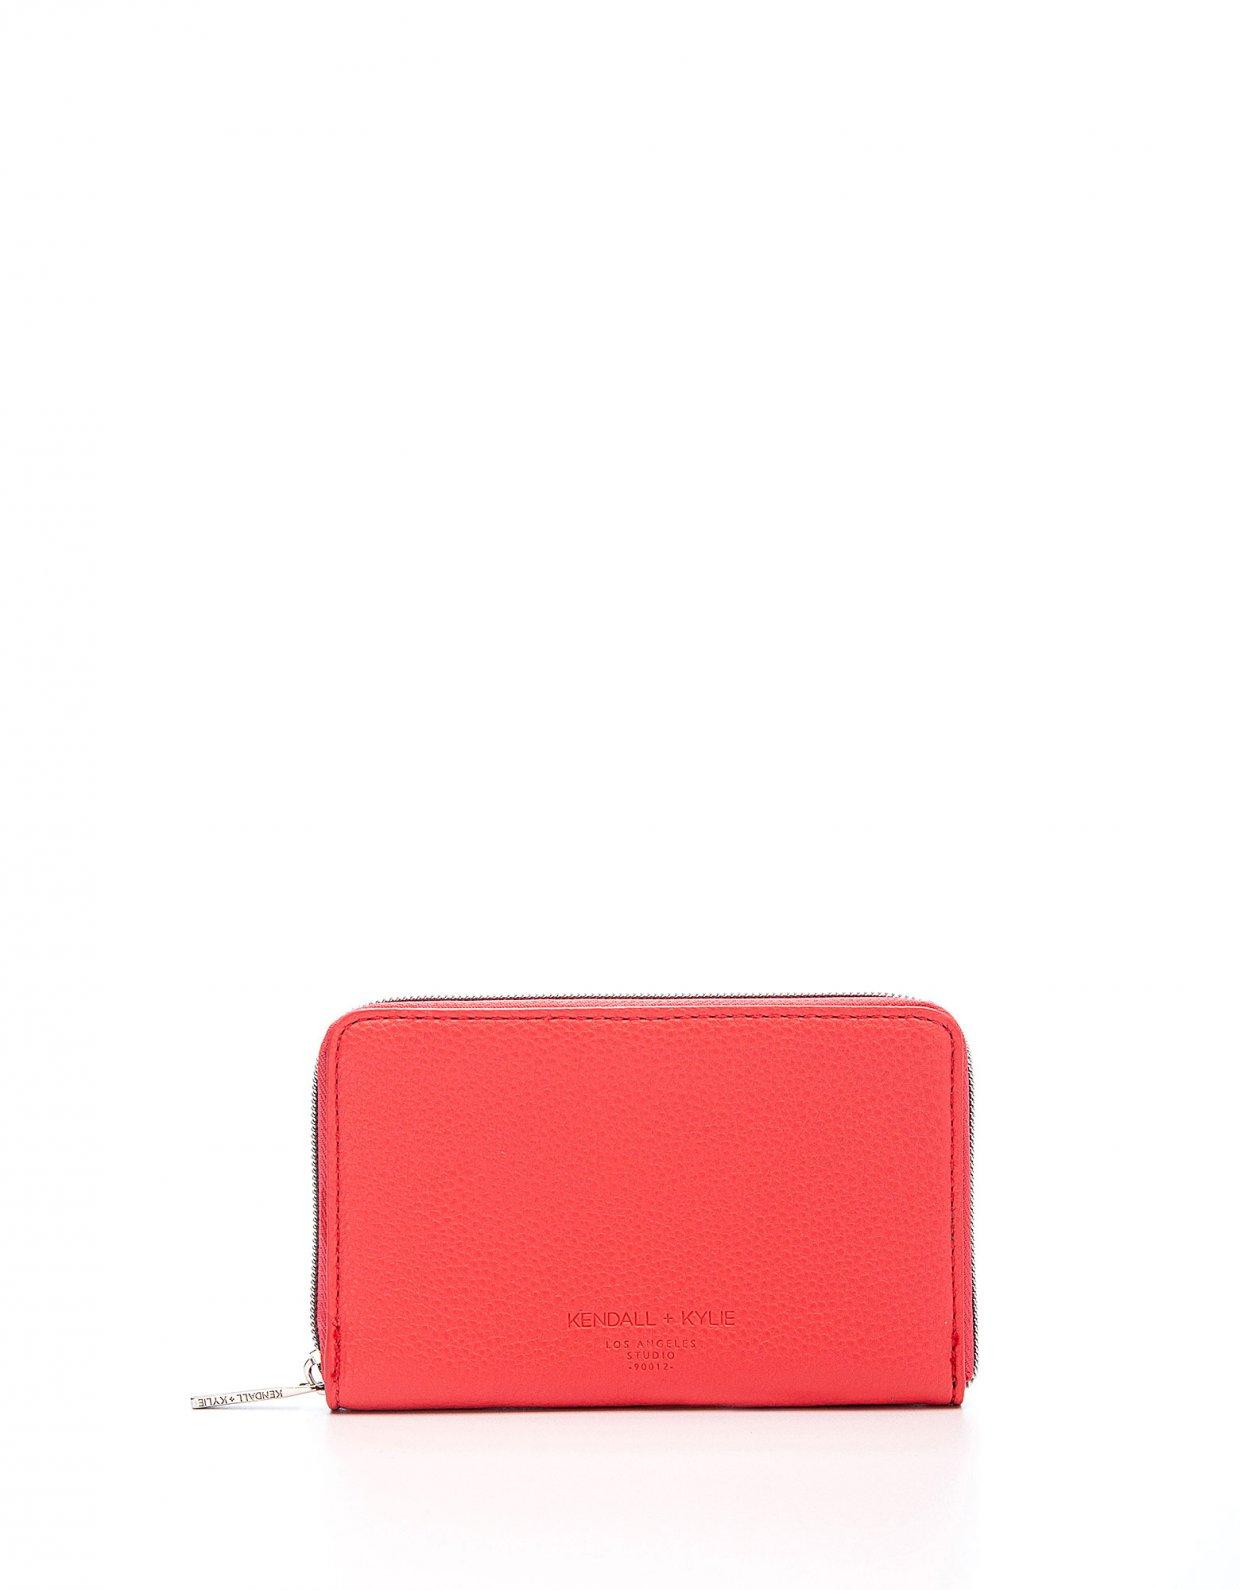 Kendall + Kylie Nina wallet fuchsia